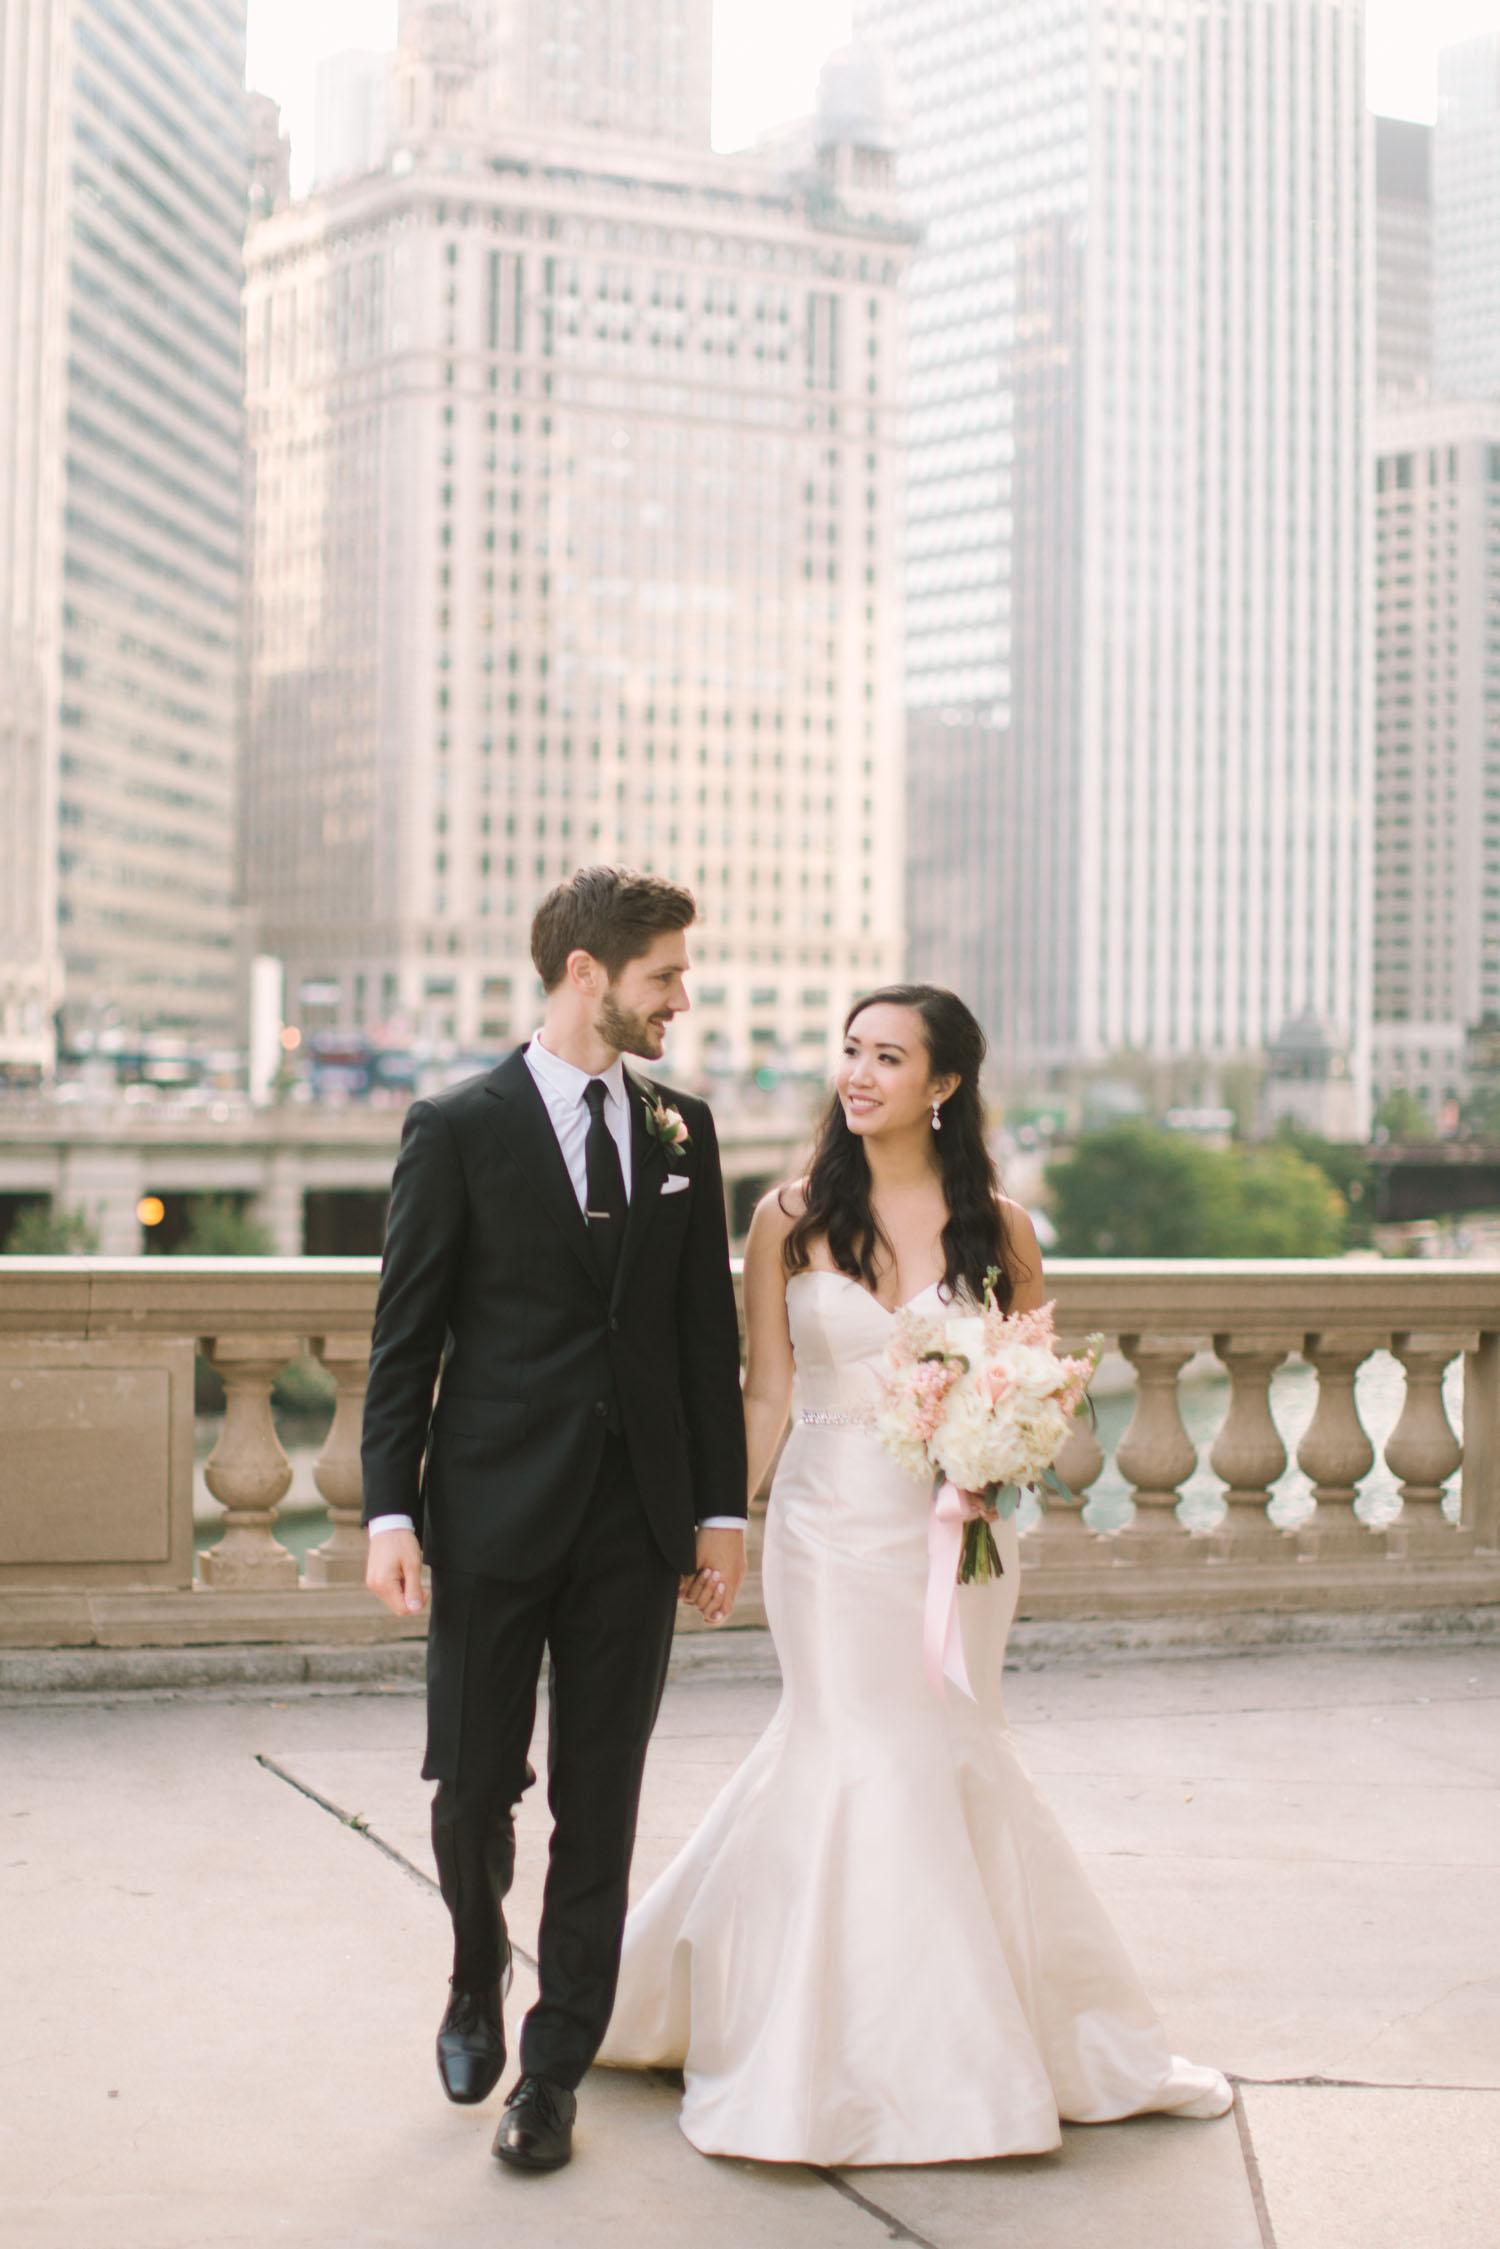 kateweinsteinphoto_beckykurt_wedding-547.jpg